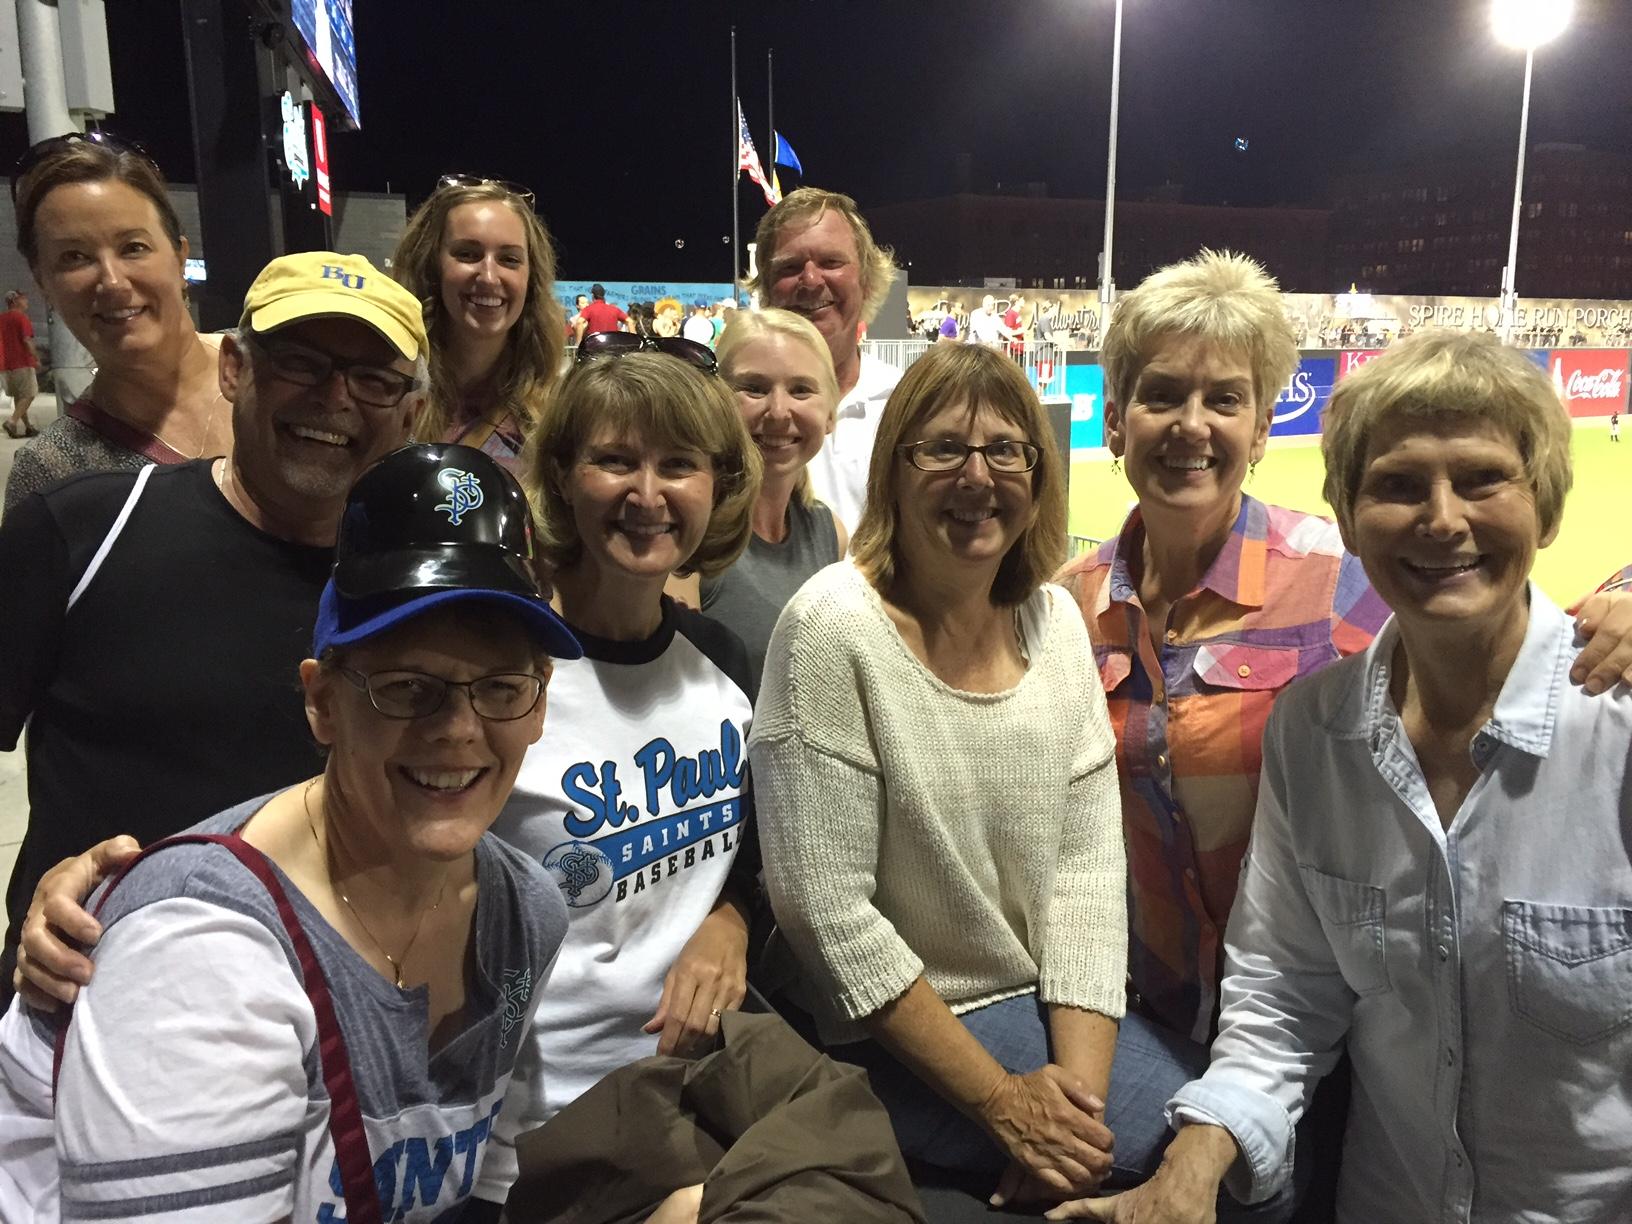 Small group at at St. Paul Saints game.